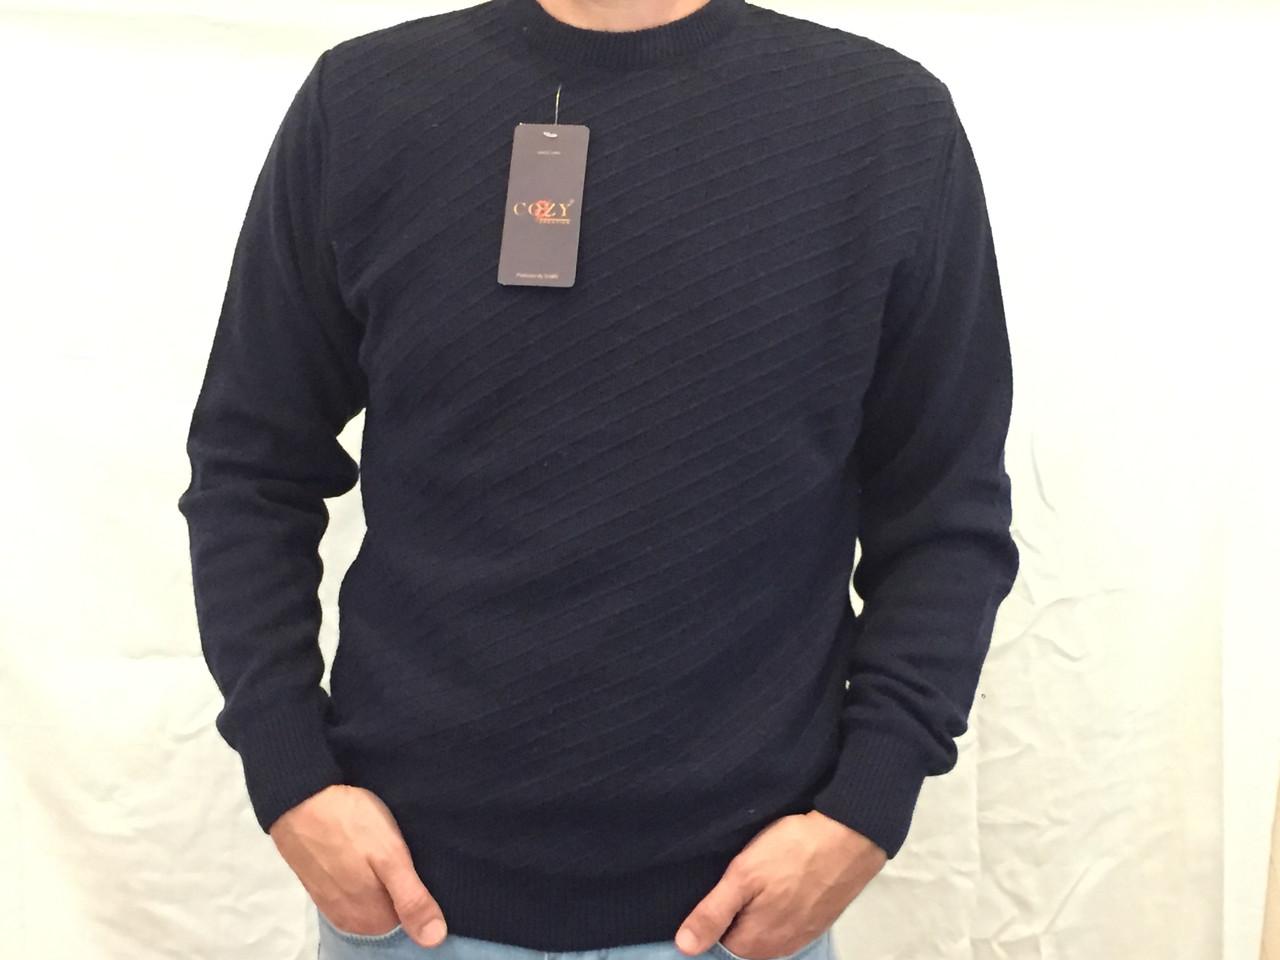 Мужской теплый свитер № 1665 синий ромбики